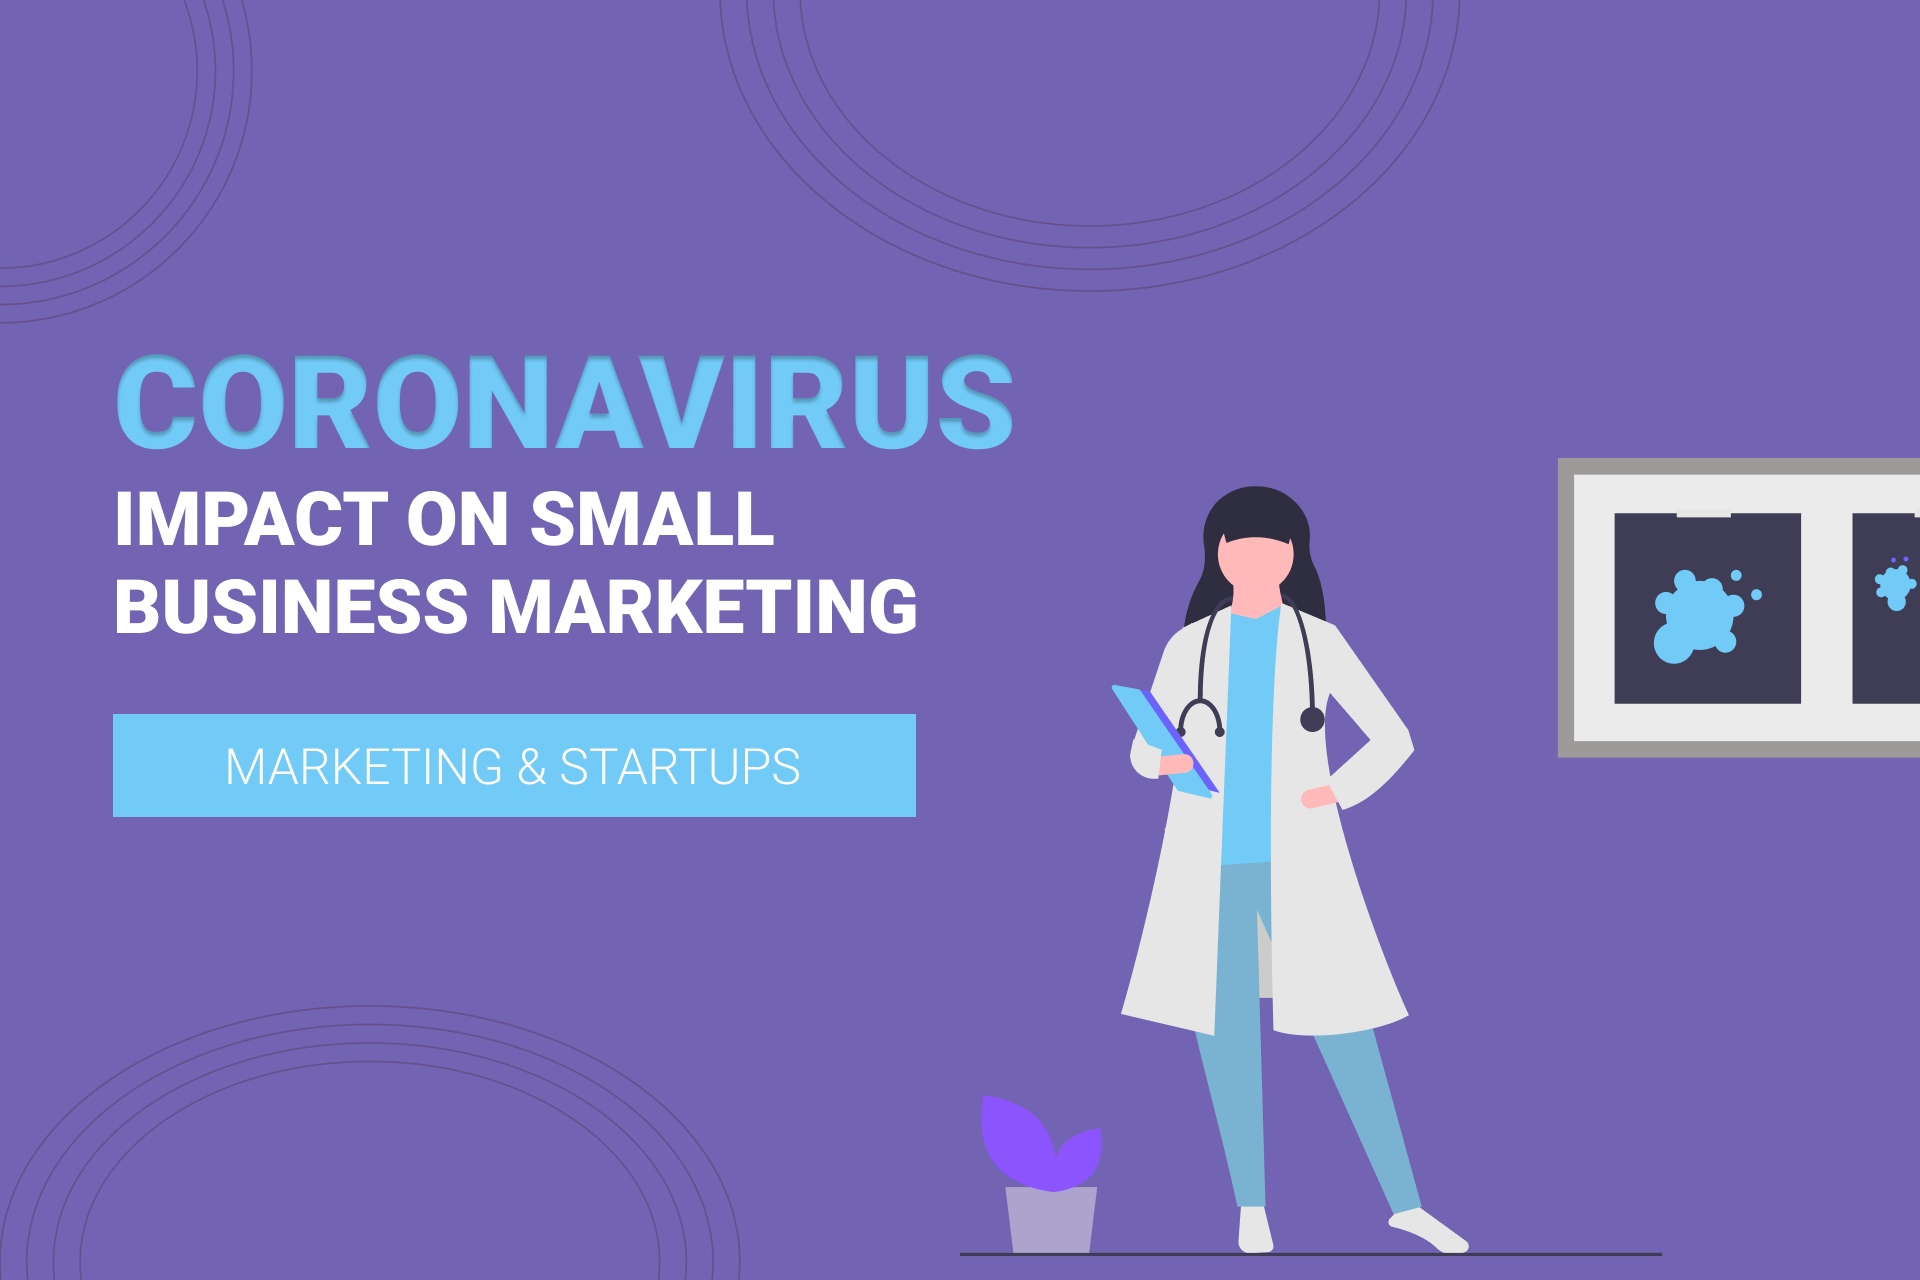 The Impact of Coronavirus on Small Business Marketing